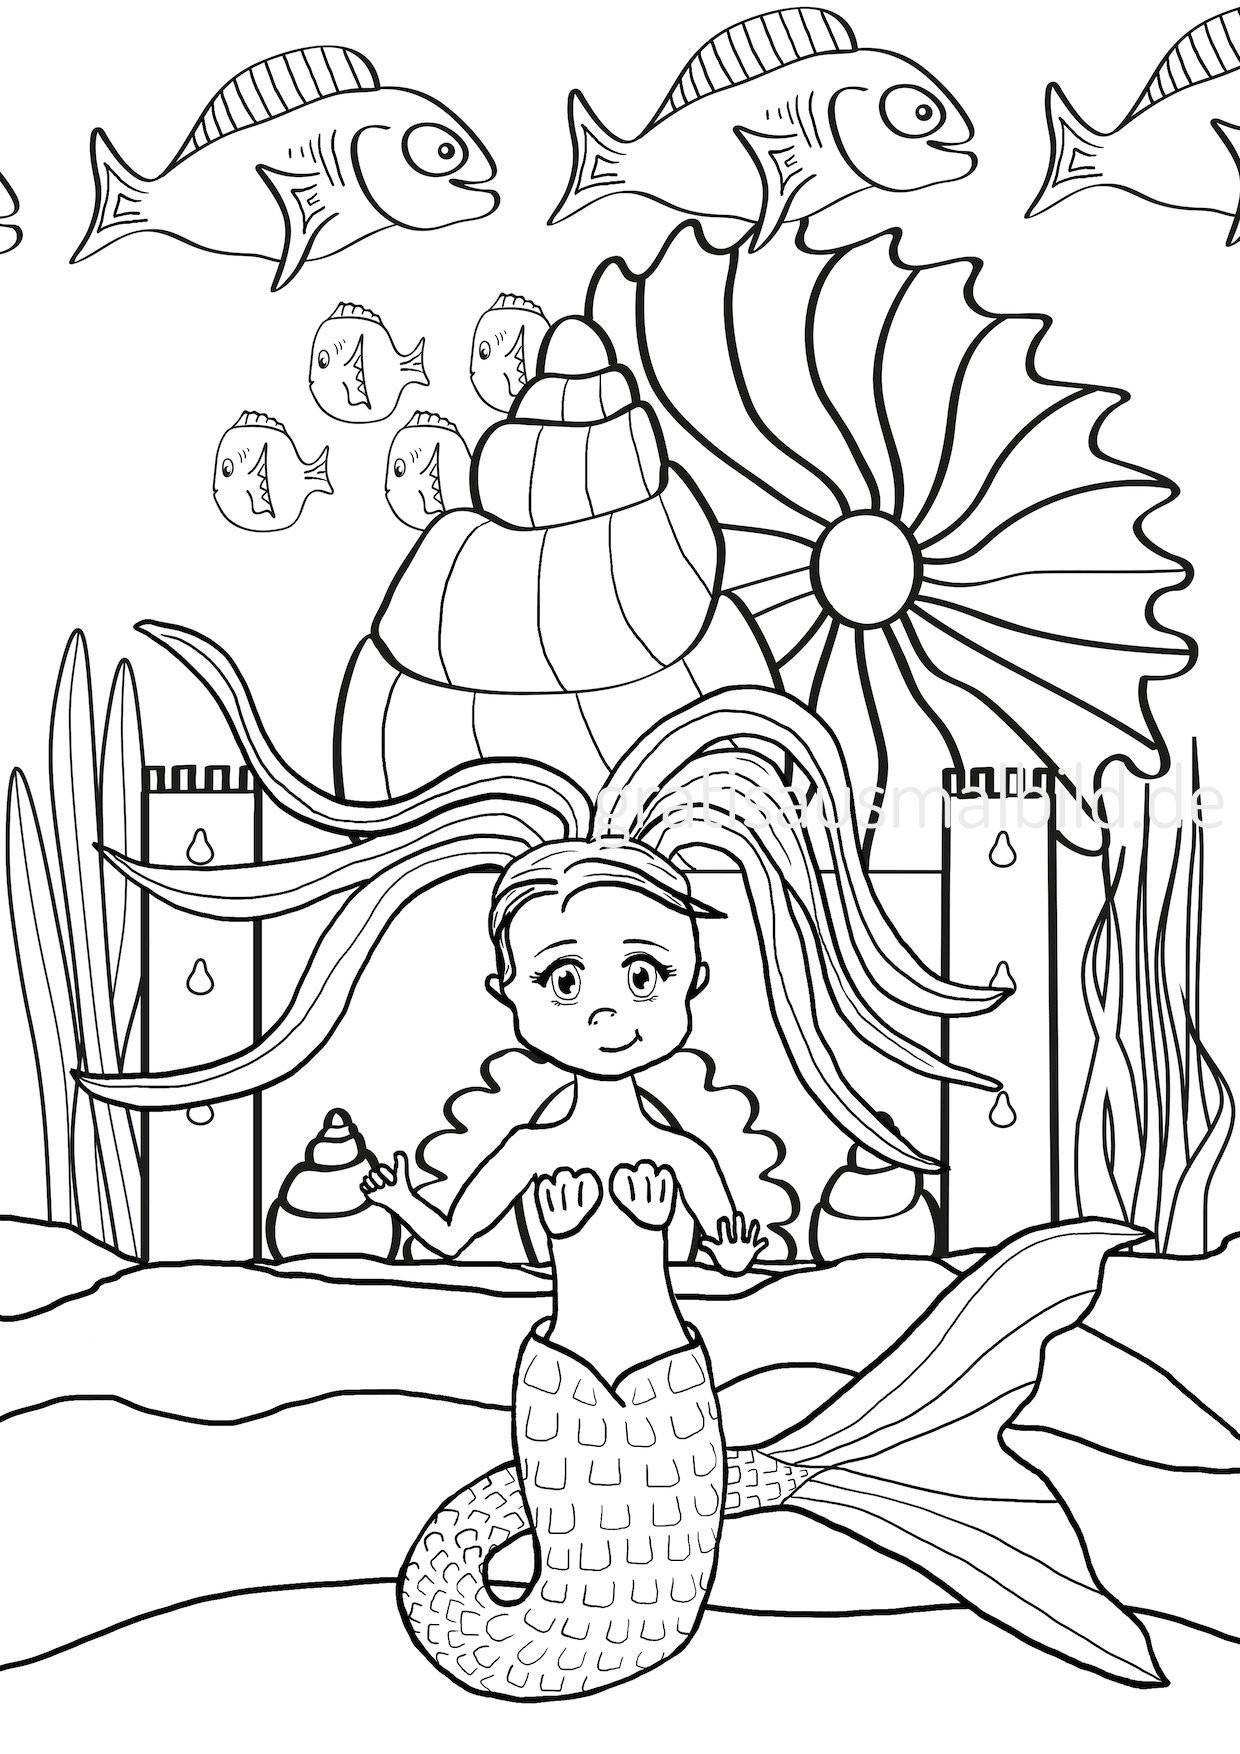 Ausmalbilder H2o Plötzlich Meerjungfrau Inspirierend Meerjungfrau Ausmalbild Sammlung